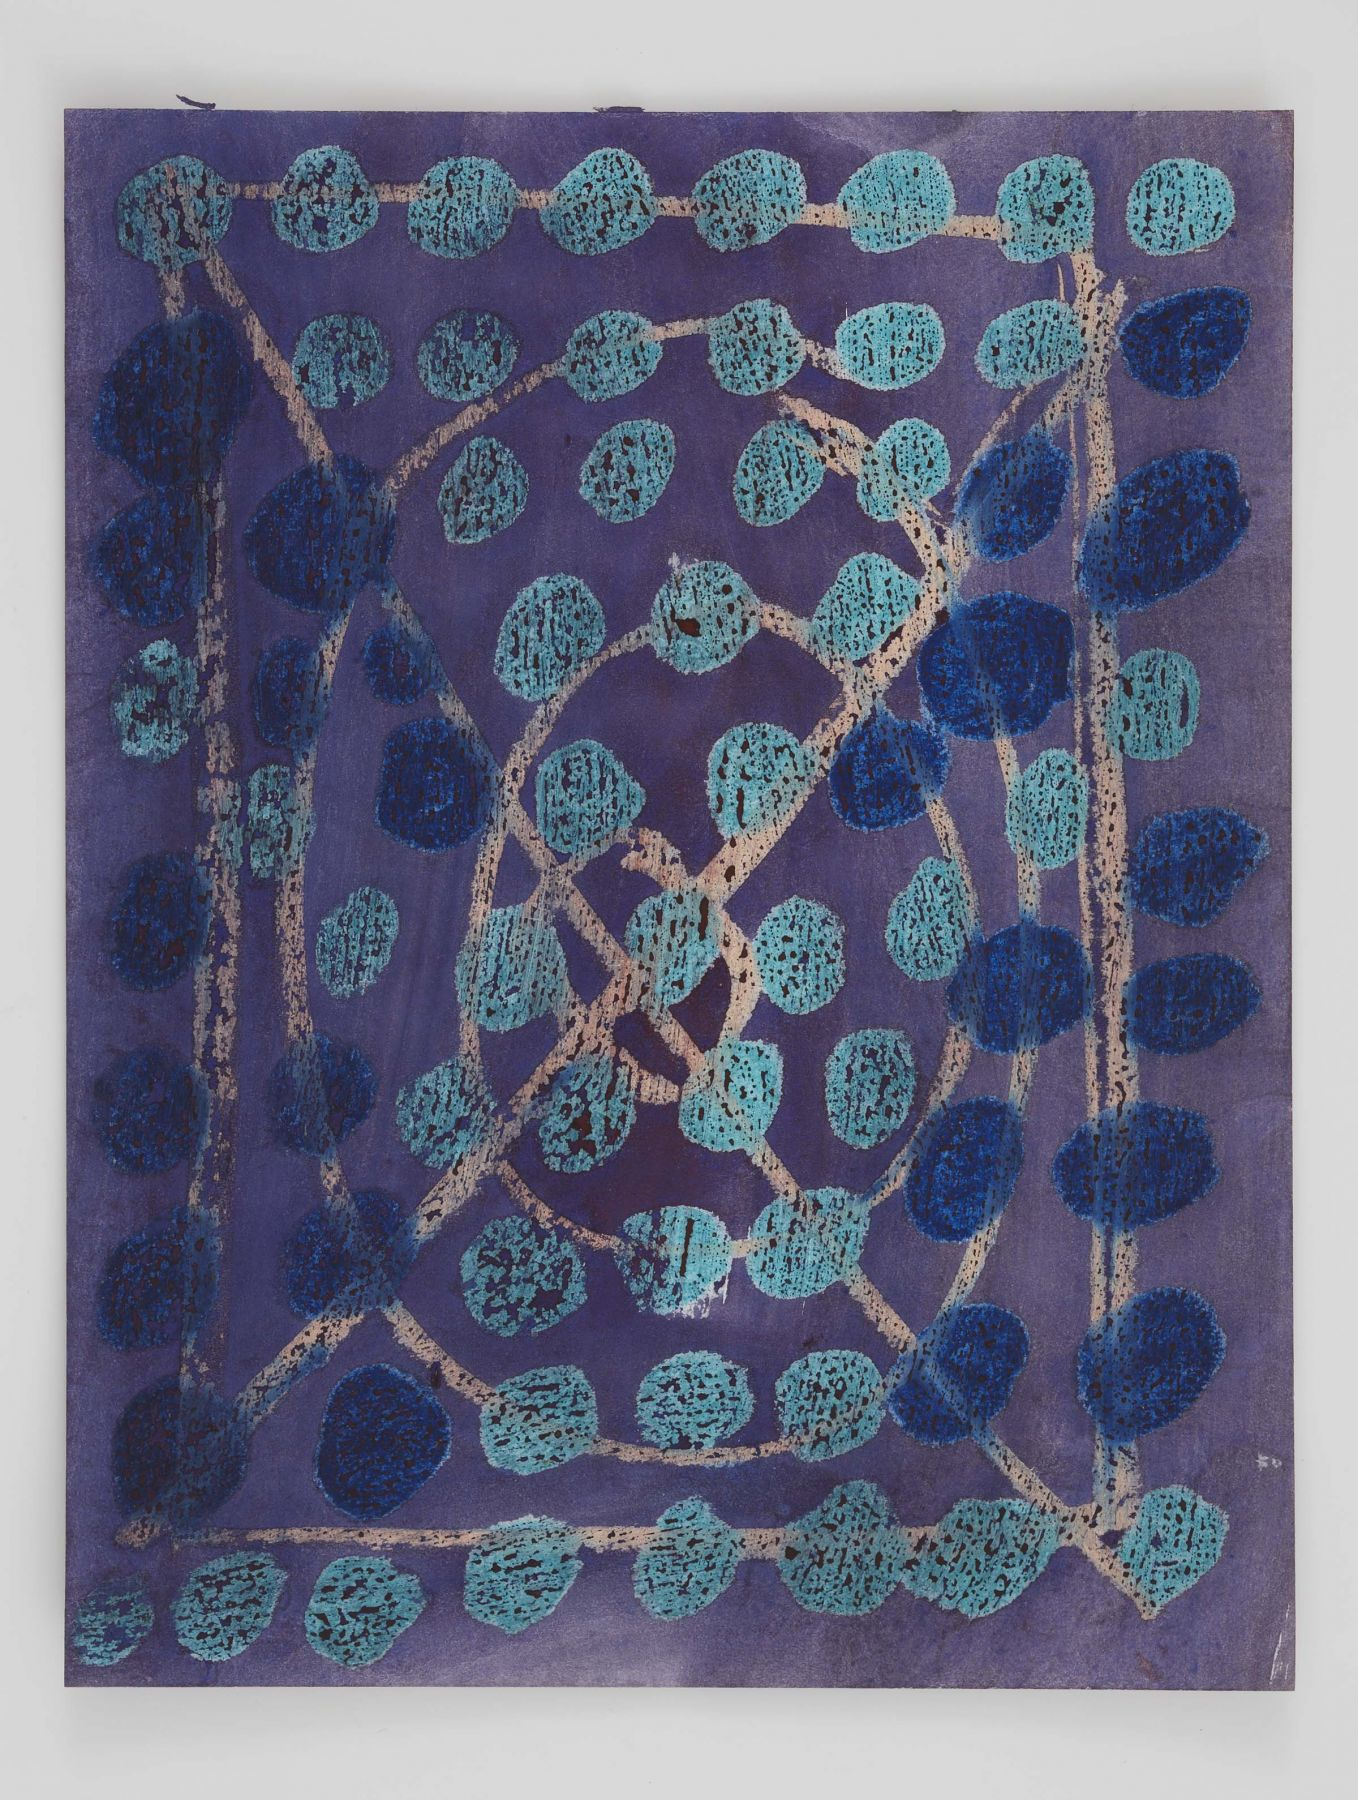 William J. O'Brien, Untitled, 2012